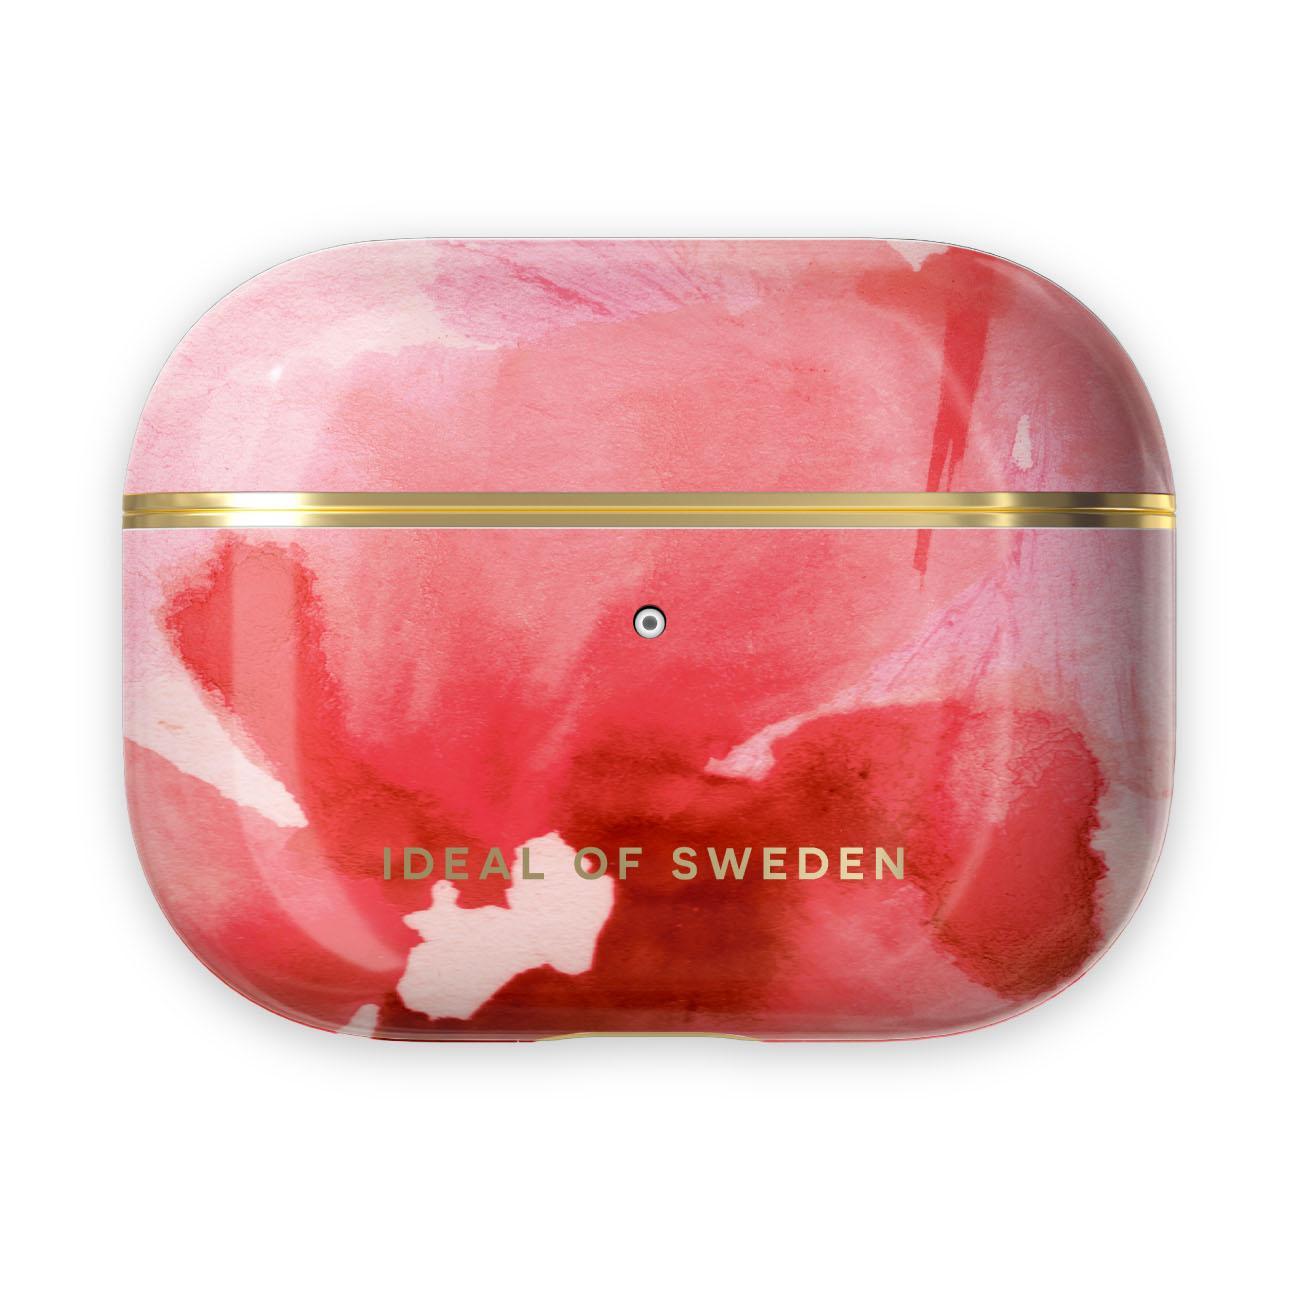 Fashion Case Apple AirPods Pro Coral Blush Floral